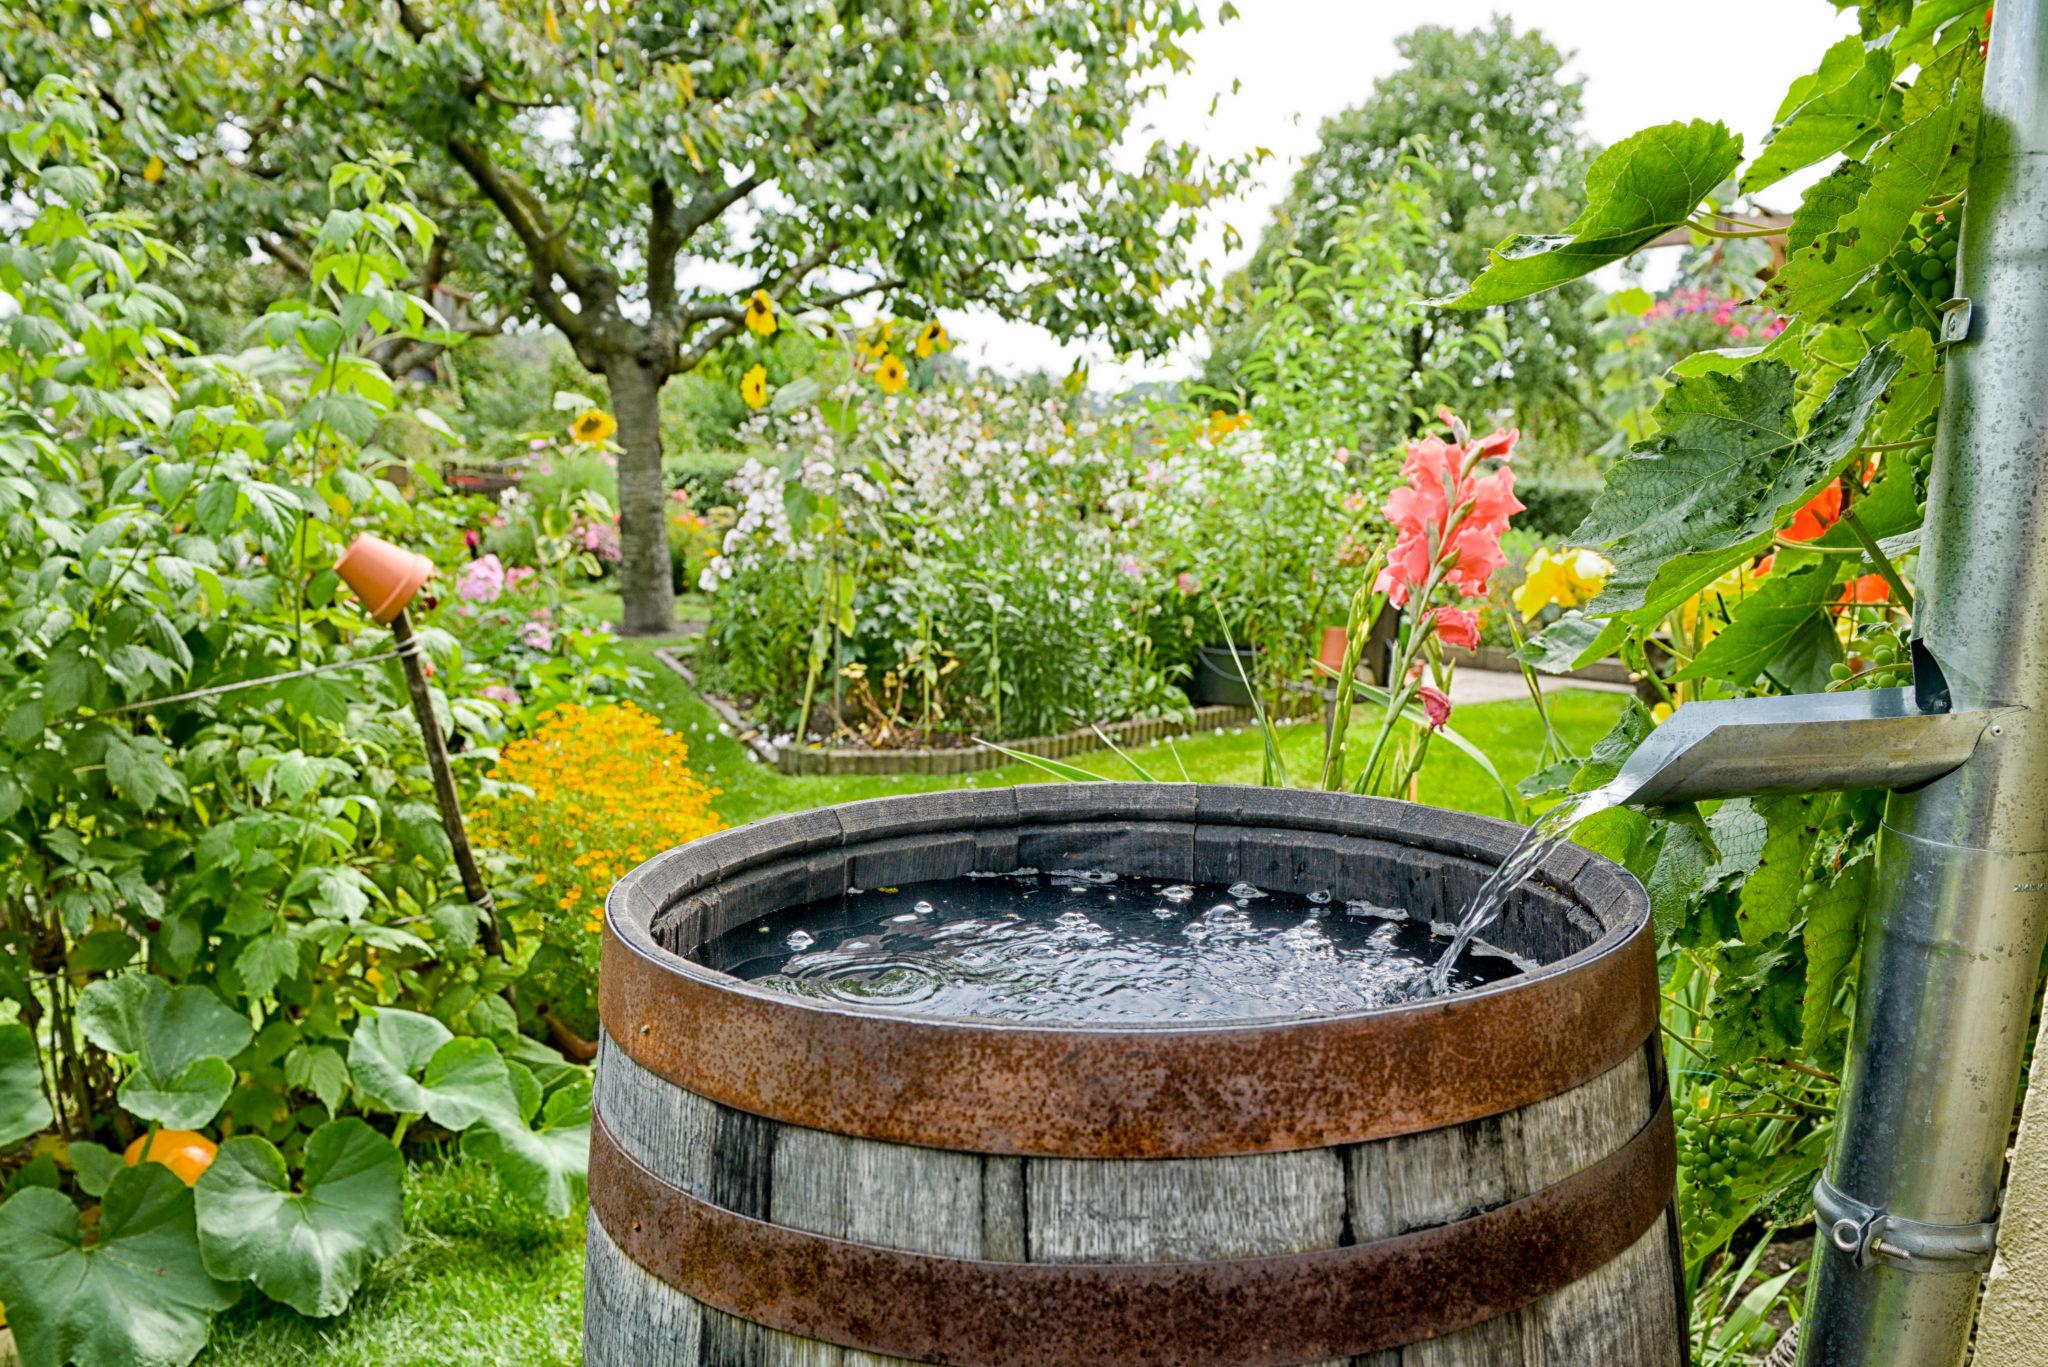 Gartenbewässerung Regentonne